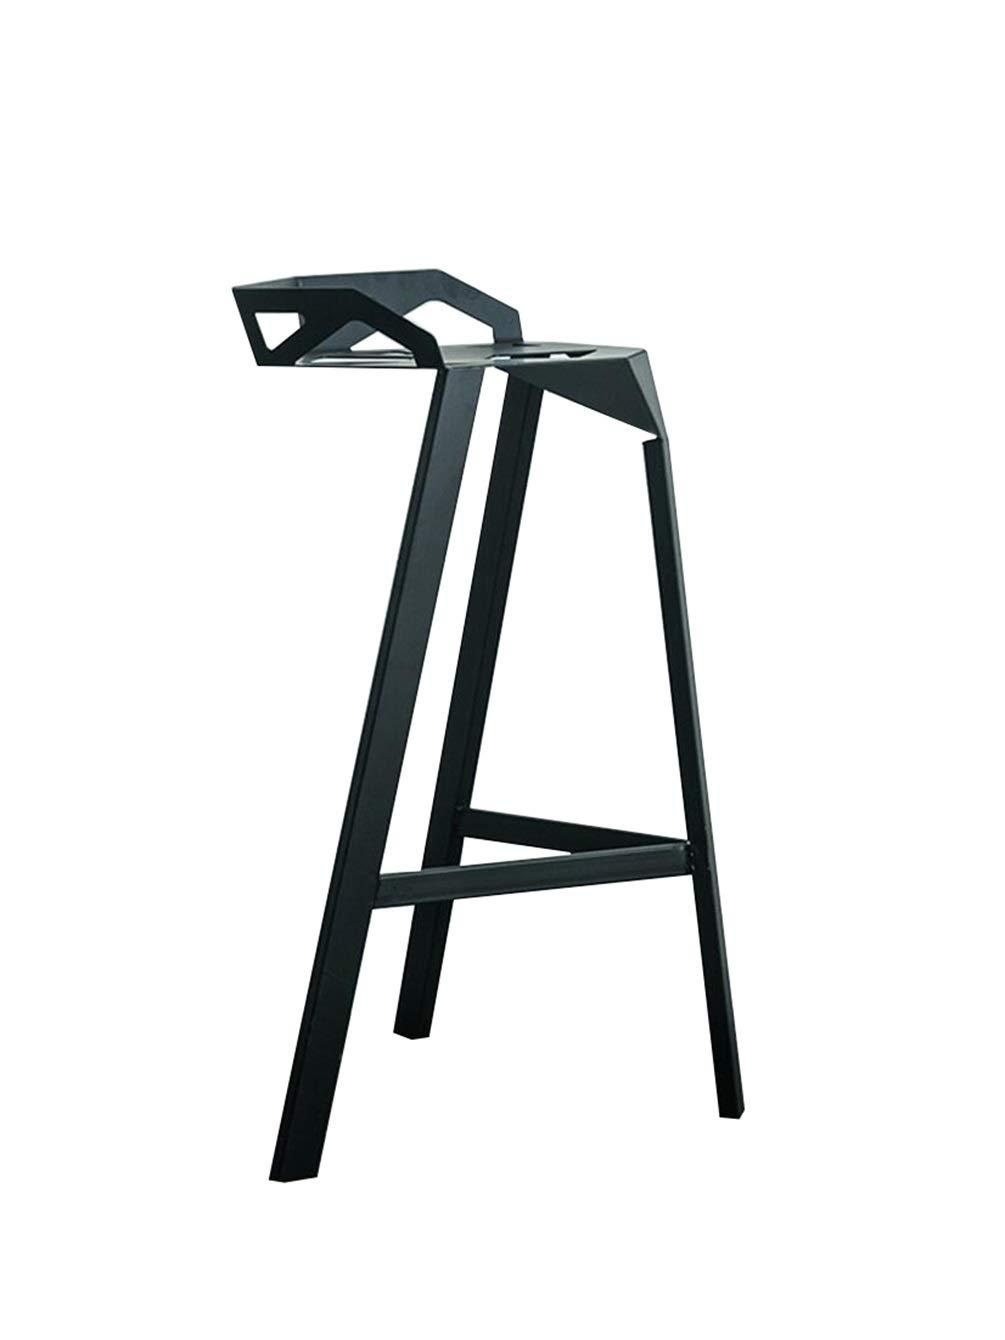 Black 75cm BARSTOOLRI Bar Stool, Ergonomics Metal Adjustable Non-Slip Breakfast Stools for Kitchen Office Counter Chair (color   Black, Size   75cm)